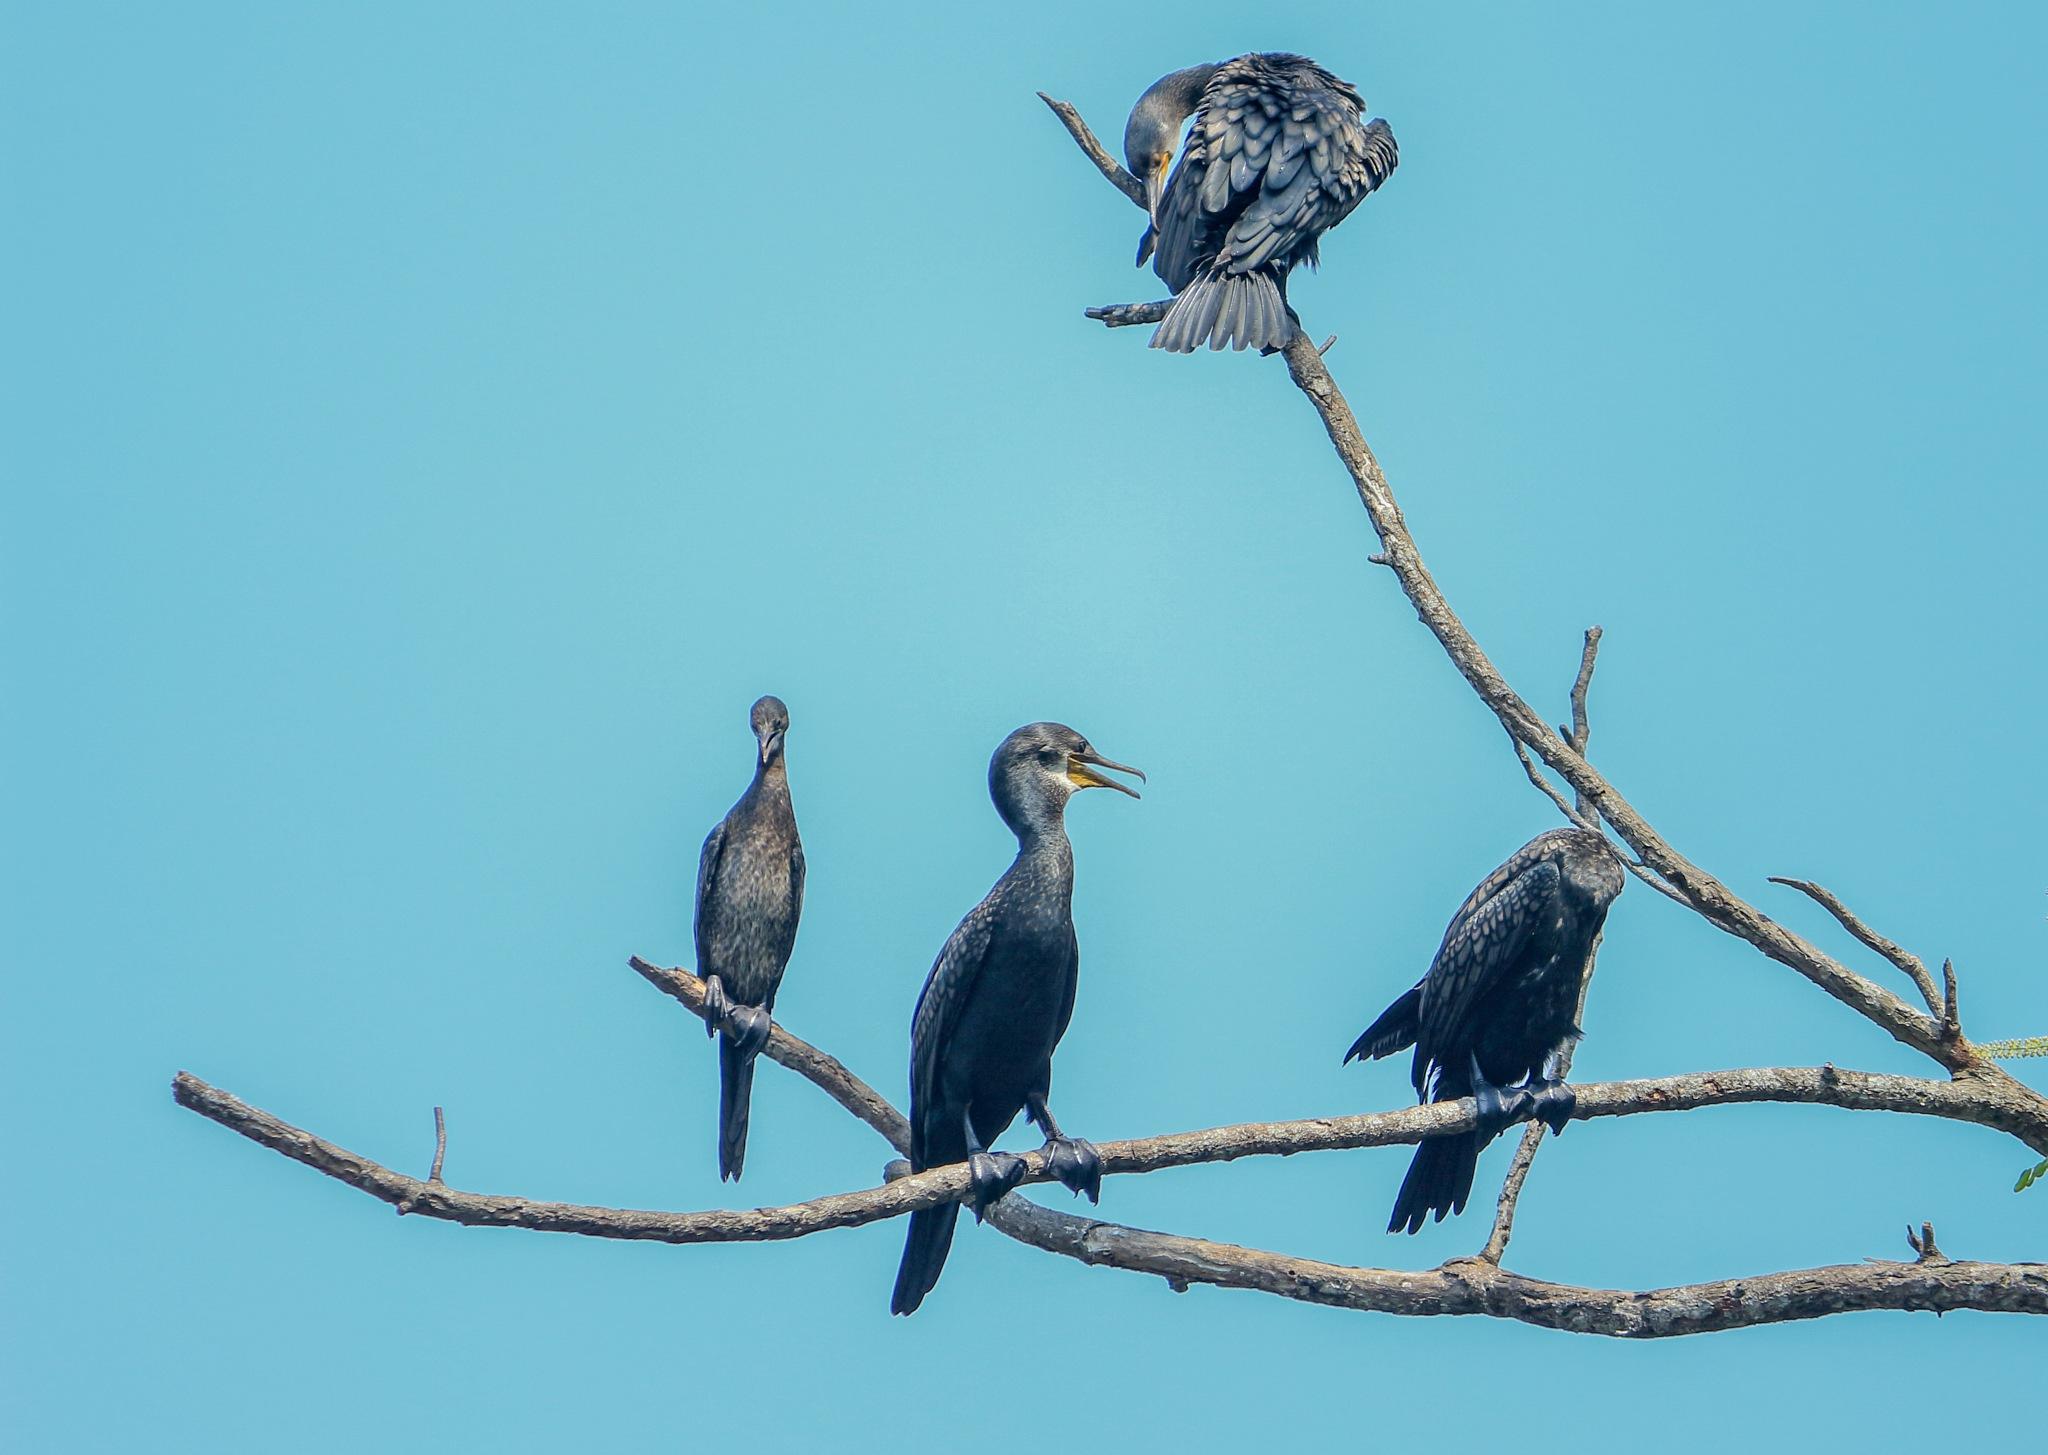 Great Cormorant by HABEEB RAHMAN